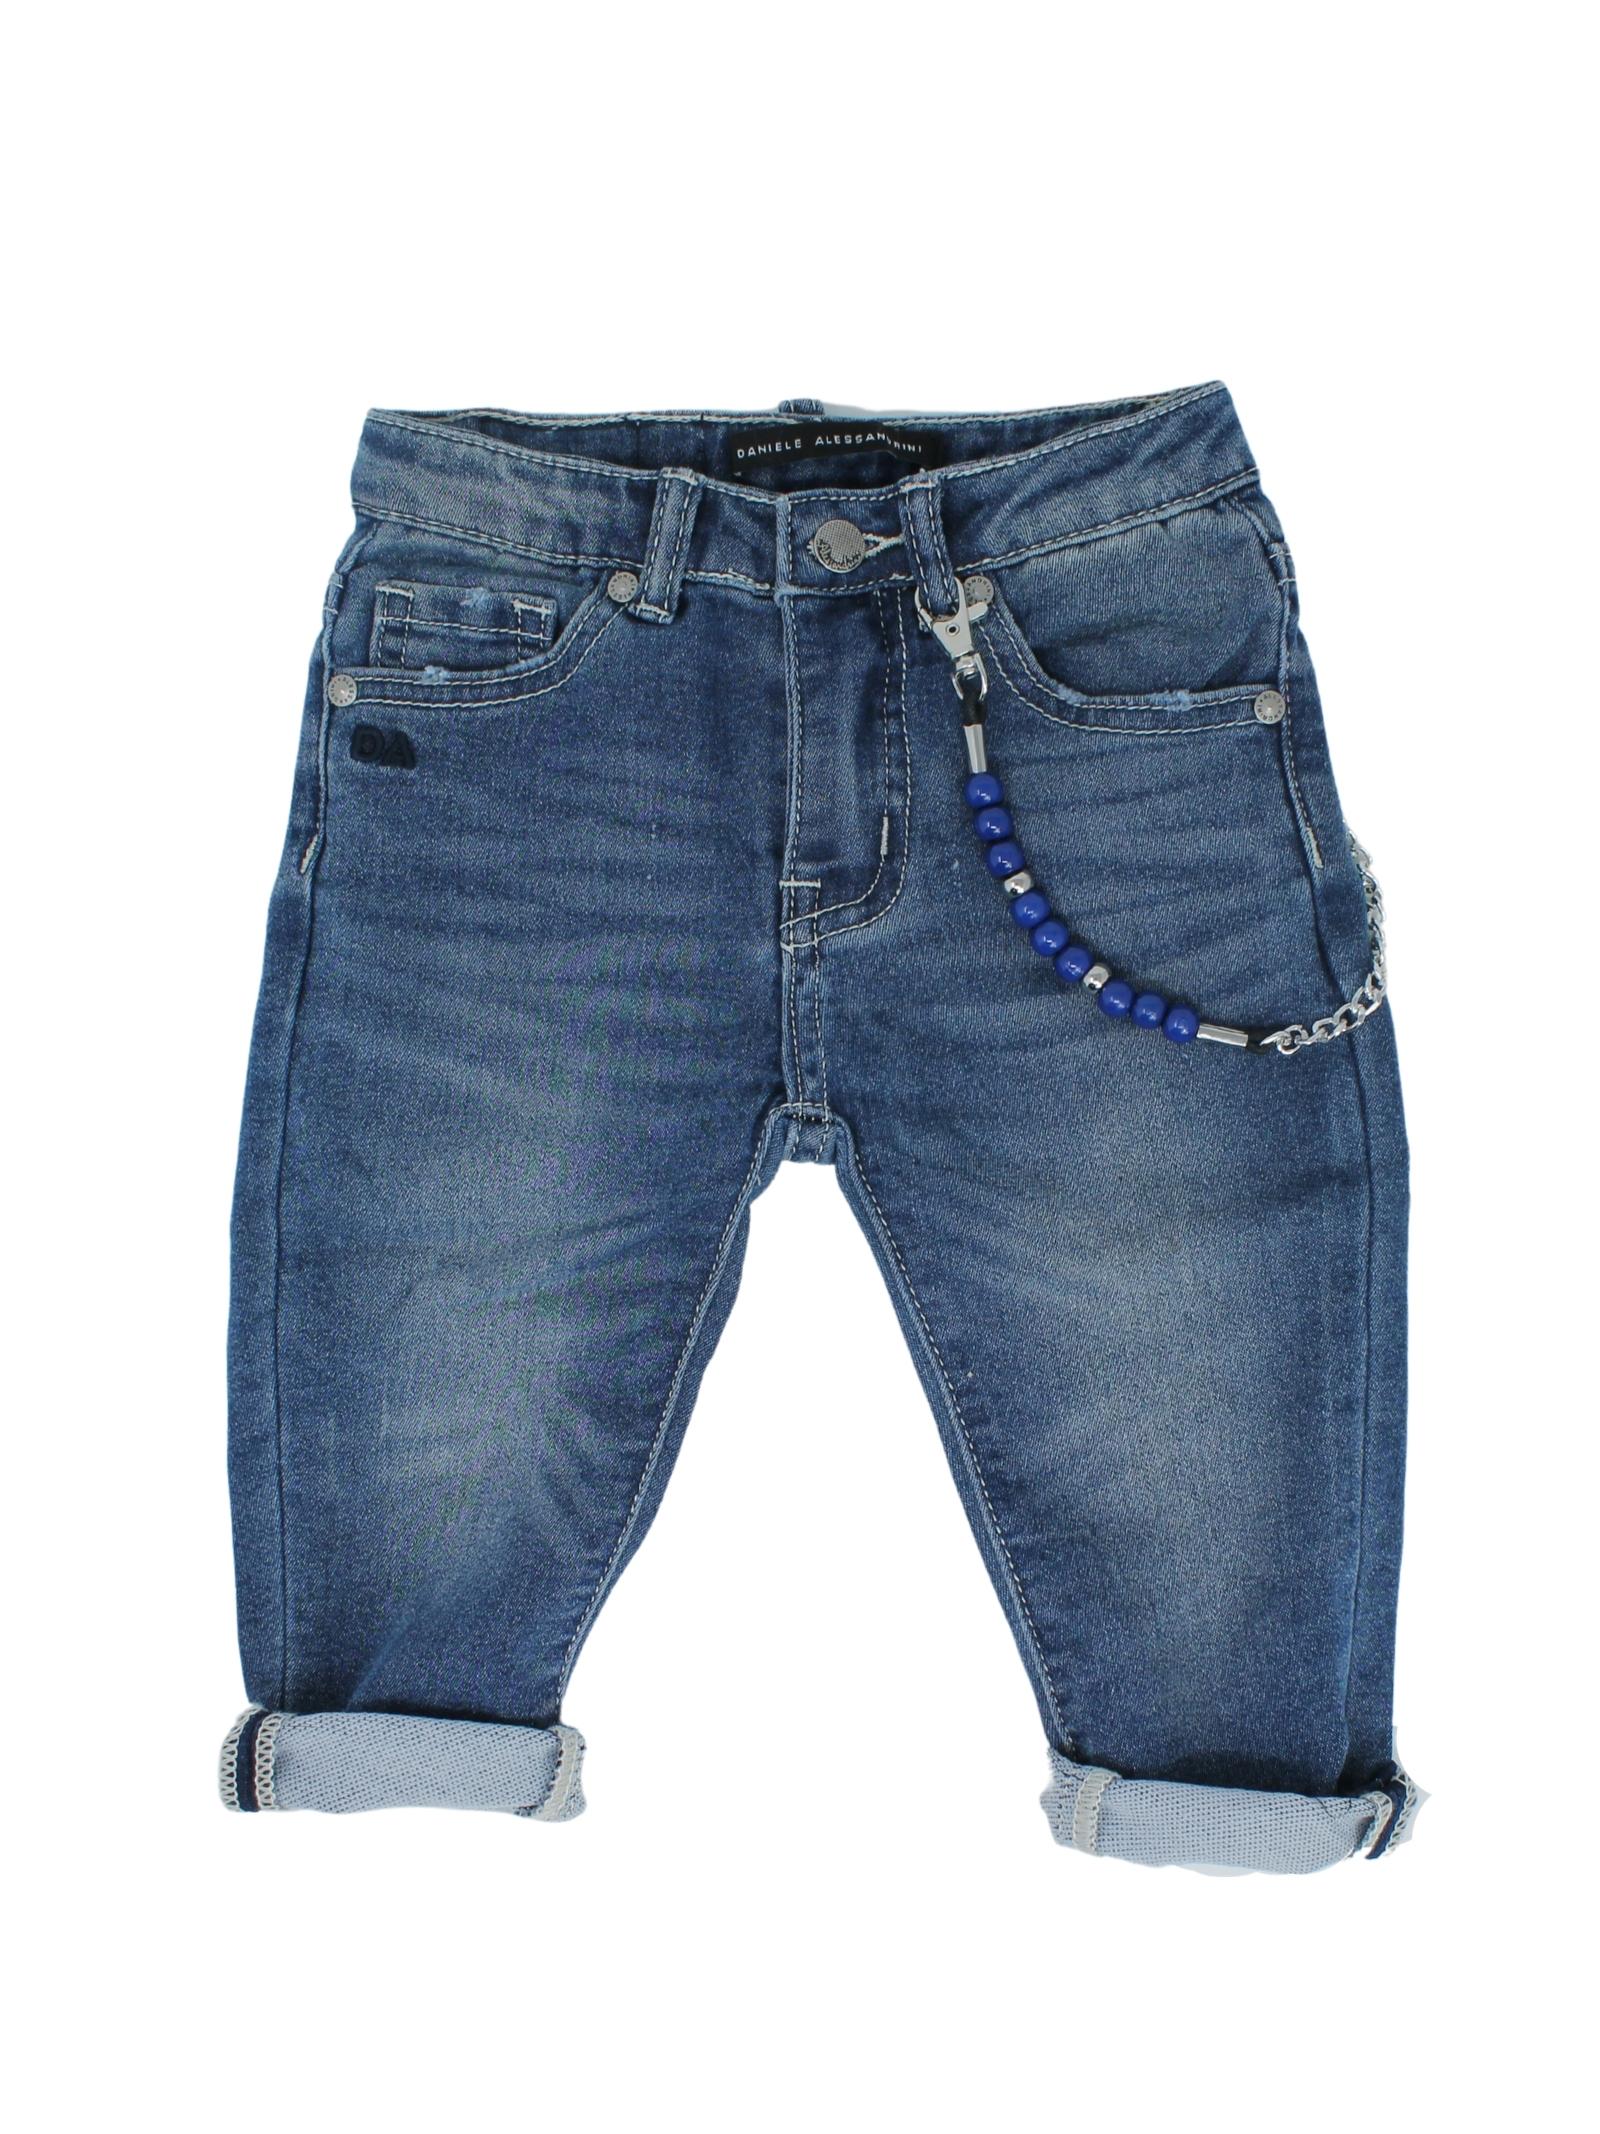 DANIELE ALESSANDRINI JUNIOR | Trousers | 1295D0528SKY